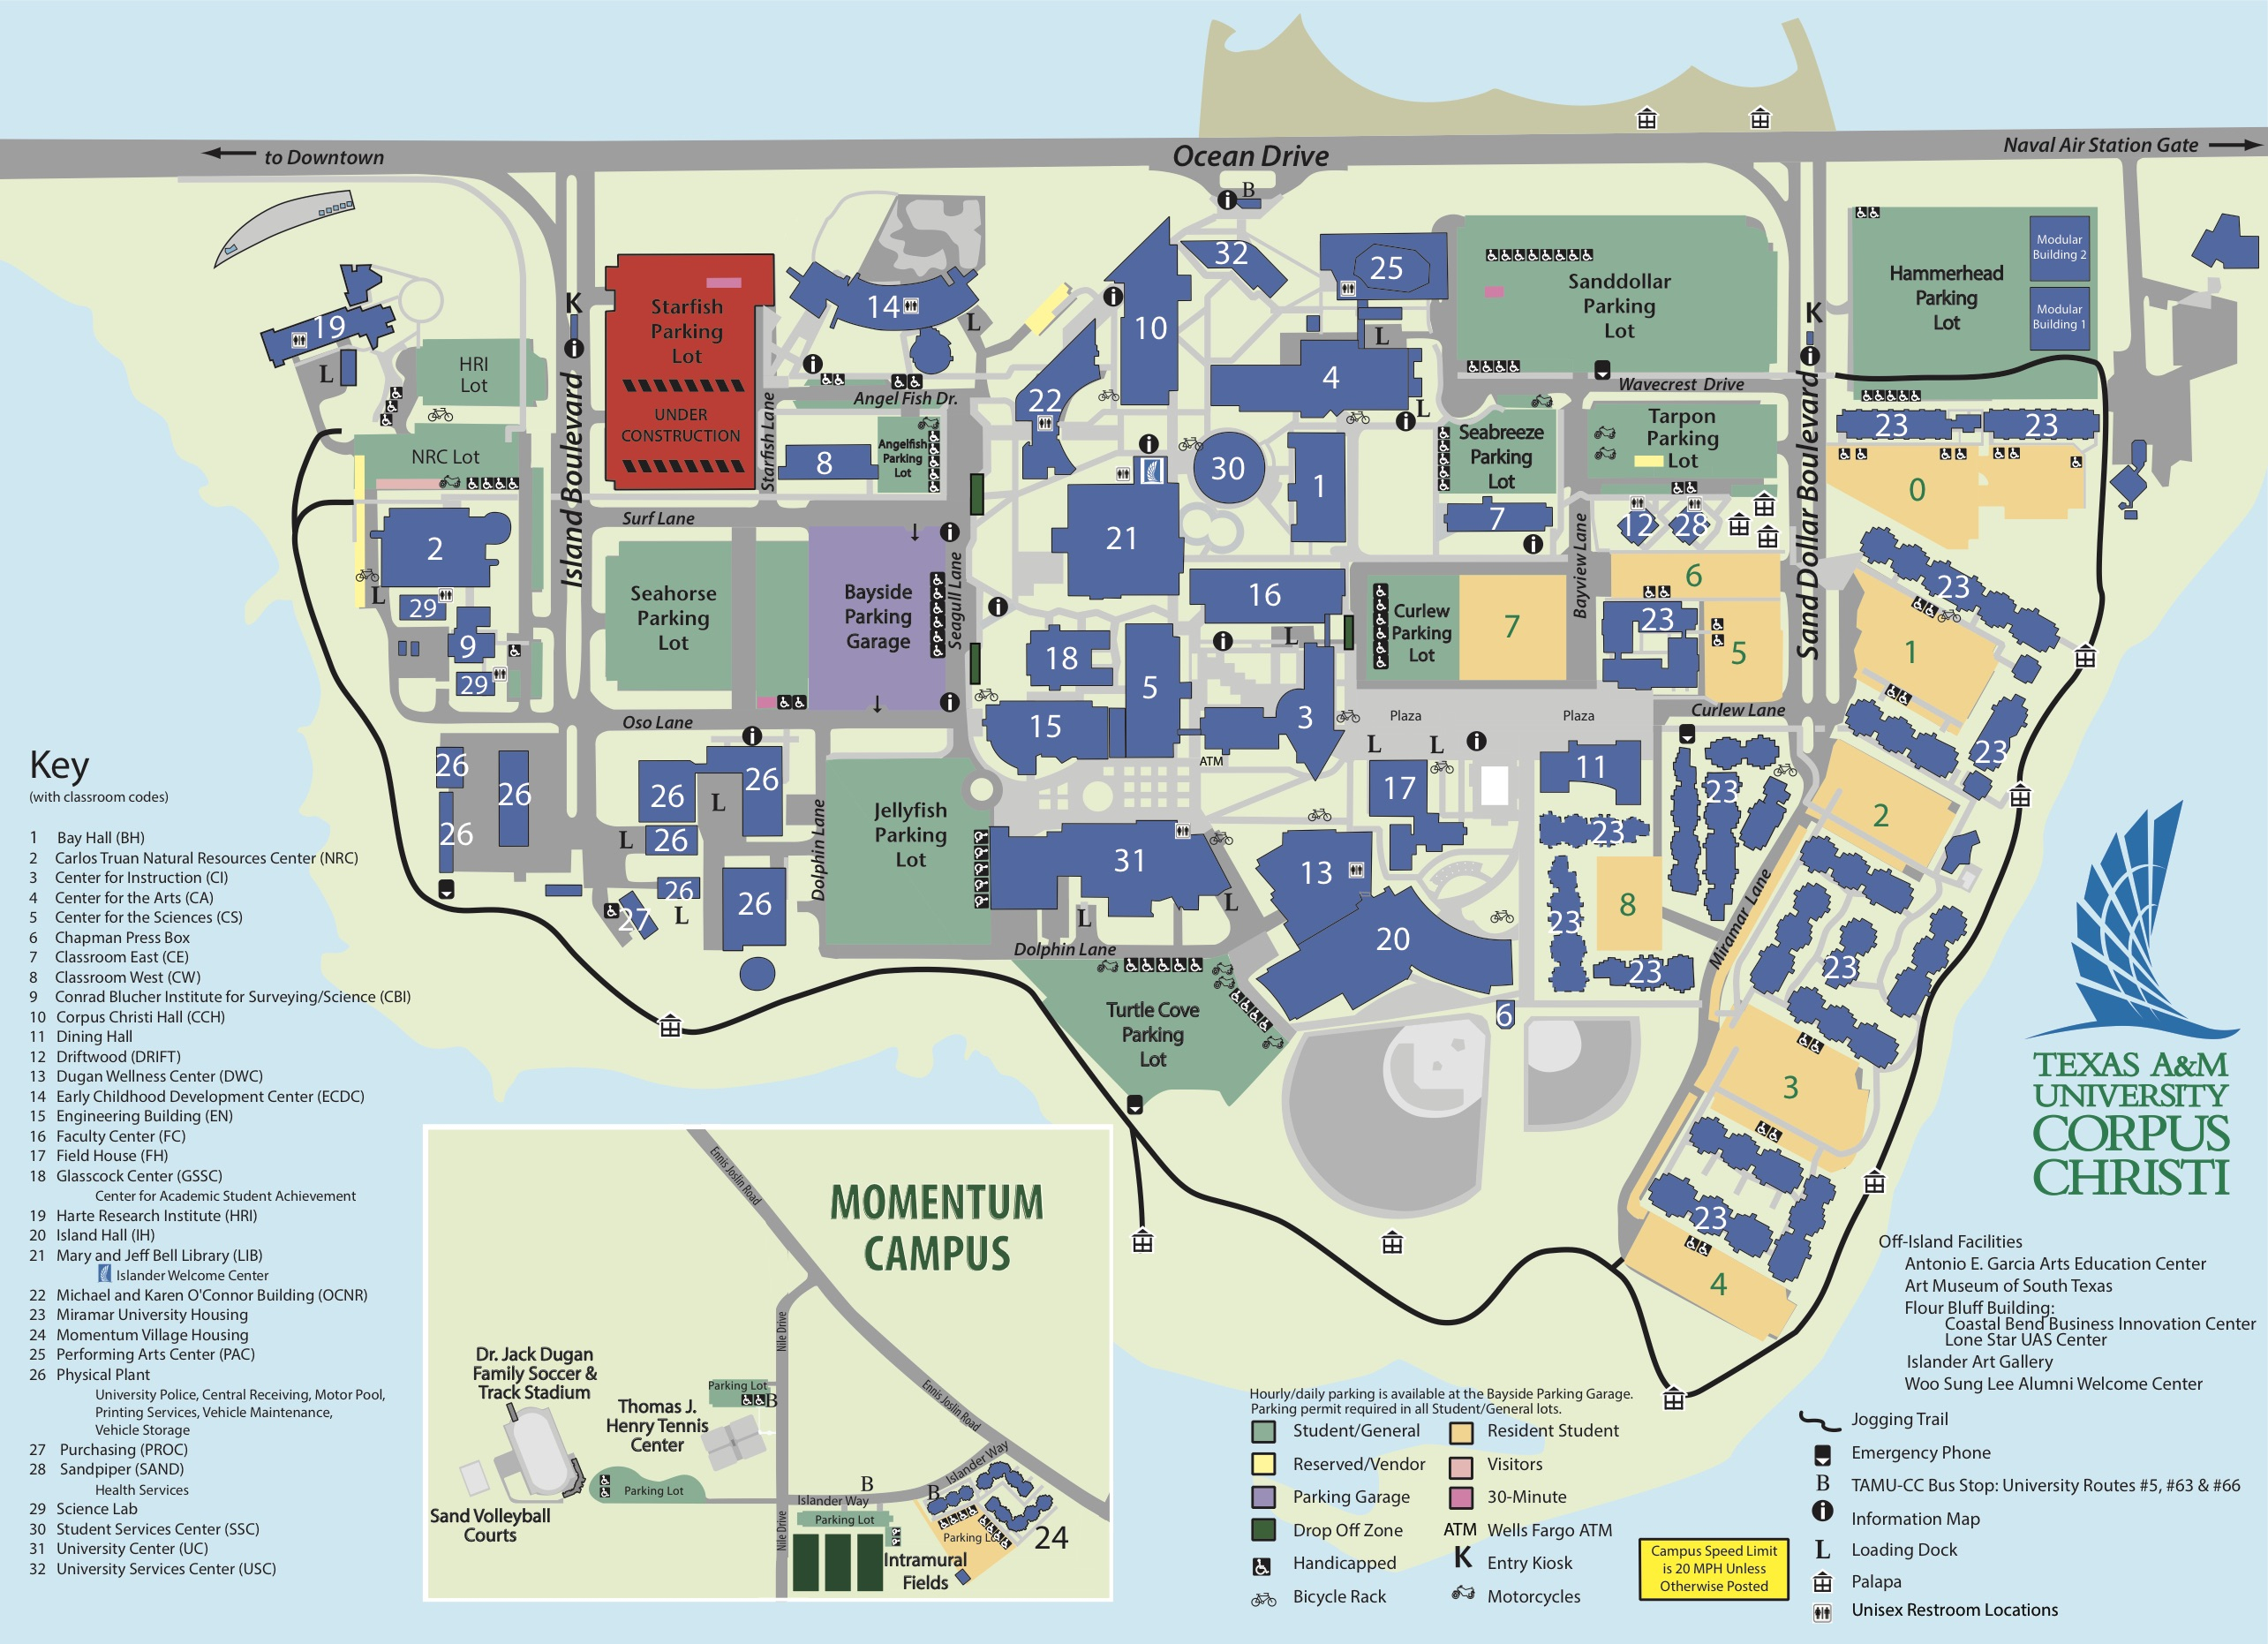 Campus Map Texas A&m University-Corpus Christi - Texas State University Housing Map